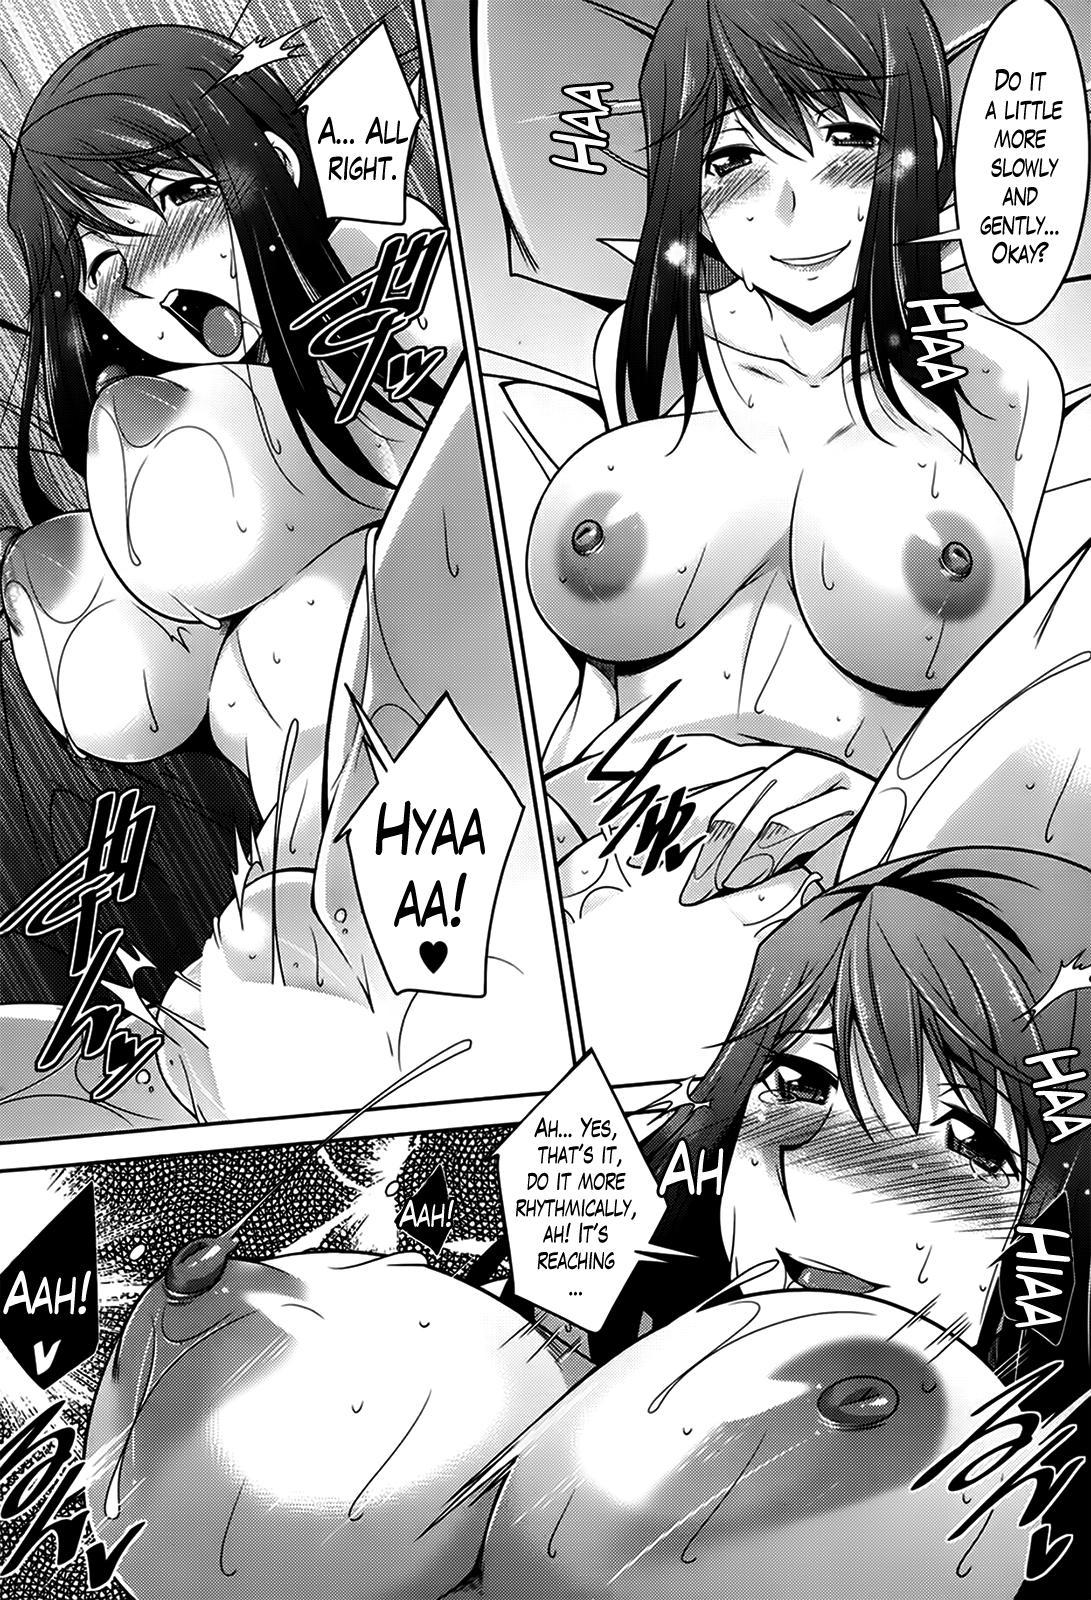 [Zen9] Taikutsu na Gogo no Sugoshikata Ch. 1-4   A Way to Spend a Boring Afternoon Ch. 1-4 (Action Pizazz DX 2013-12) [English](hentai2read.com)[Lazarus H] 71